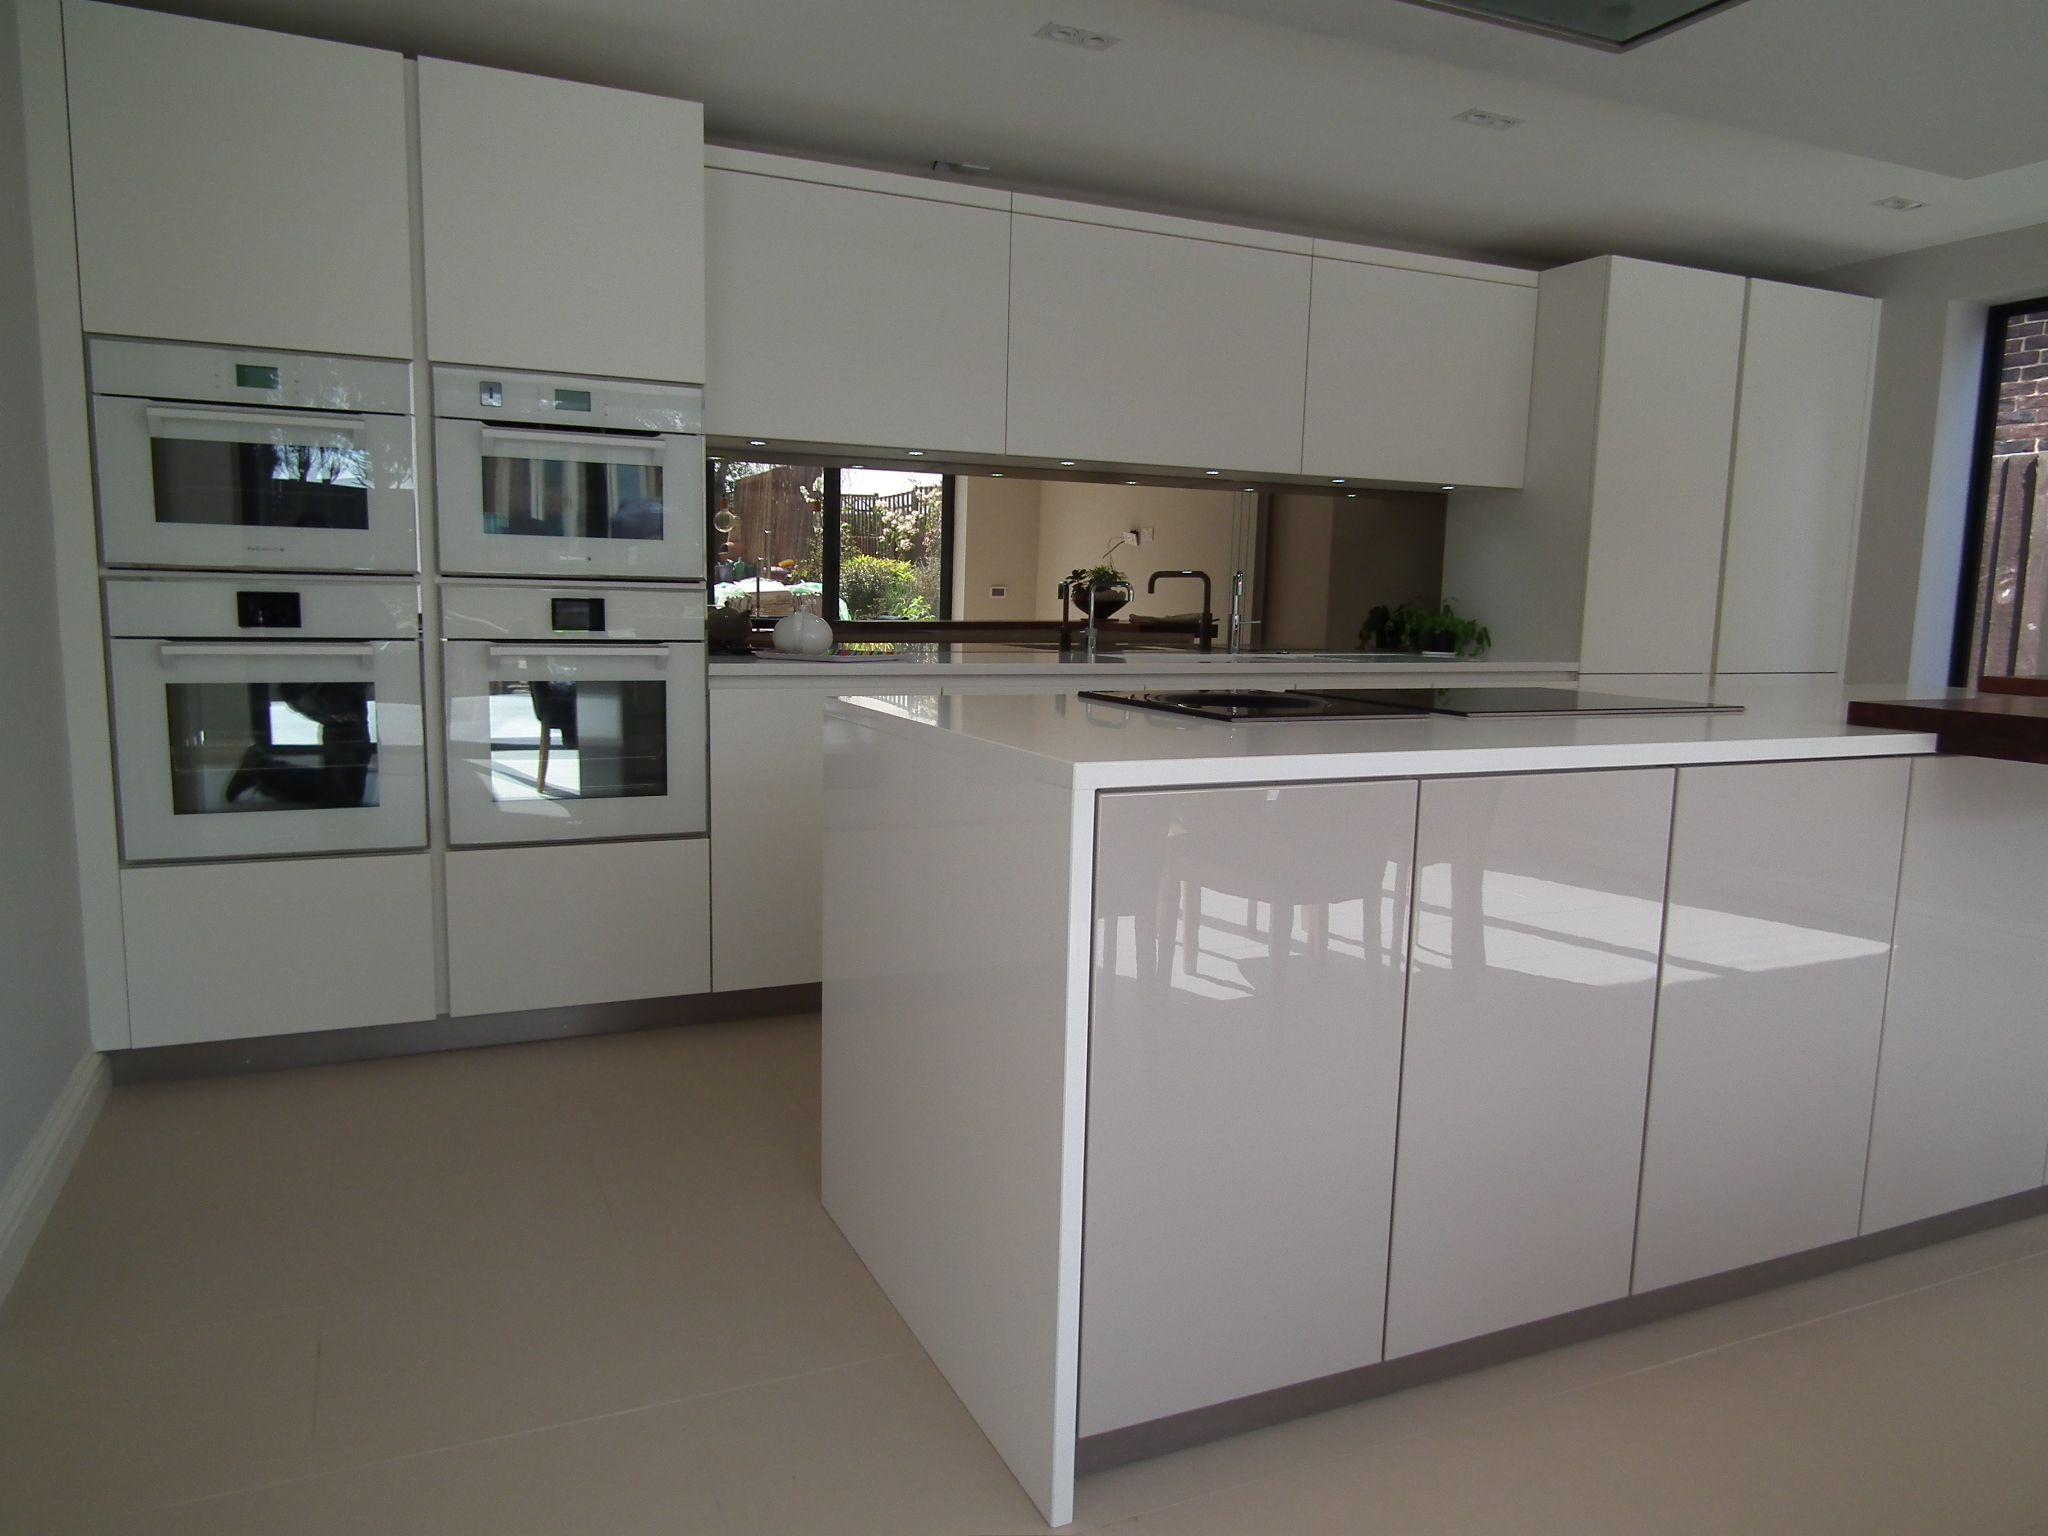 De dietrich white glass appliances www.ptckitchens.co.uk | Kitchens ...